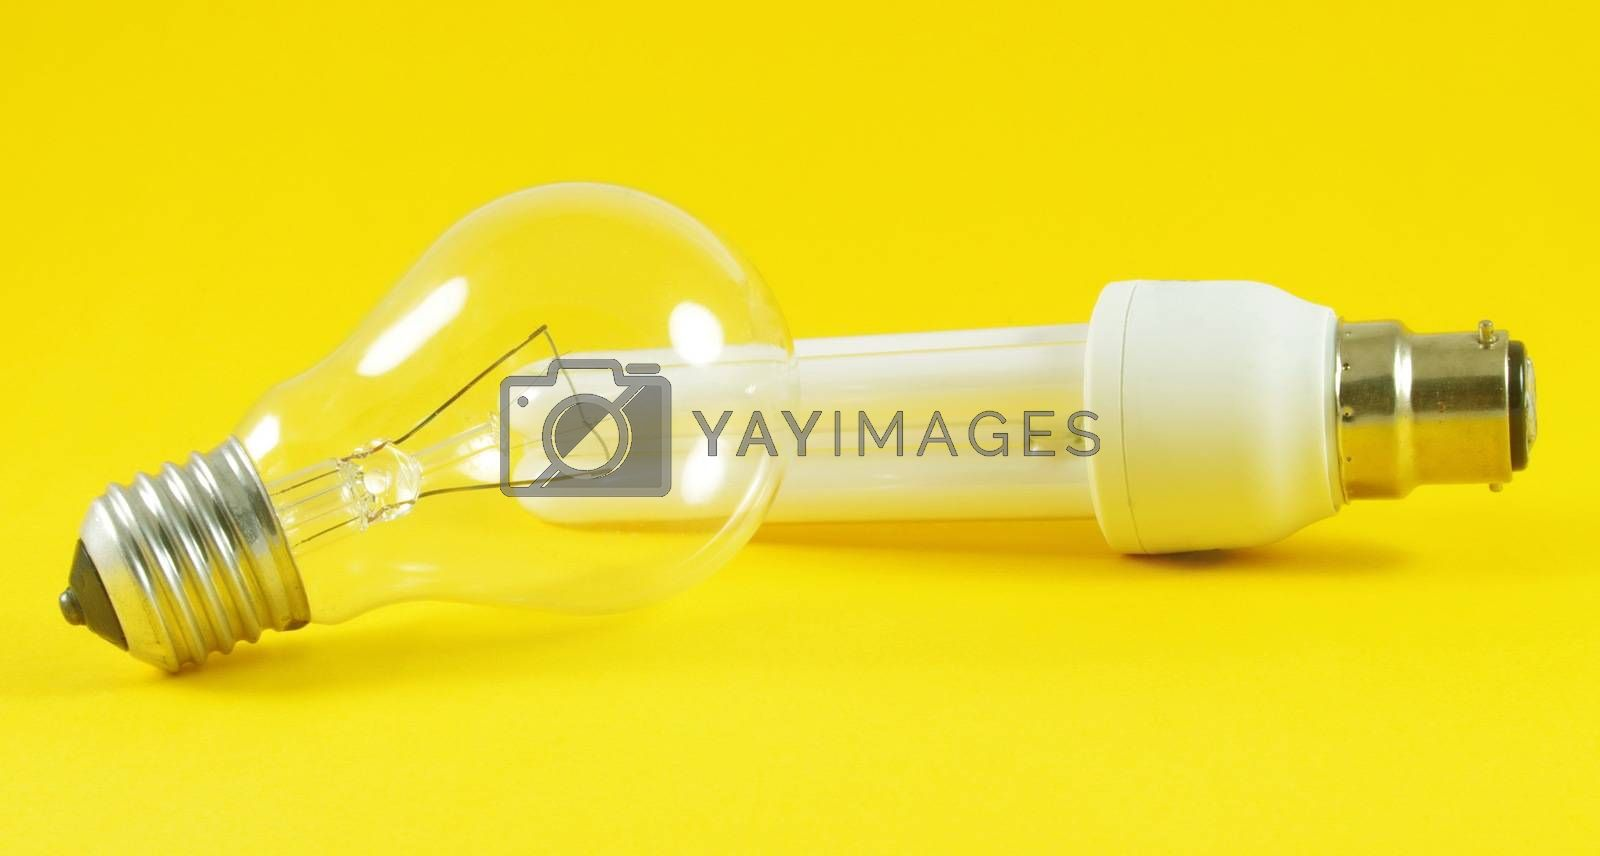 Economic and regular light bulbs over yellow background